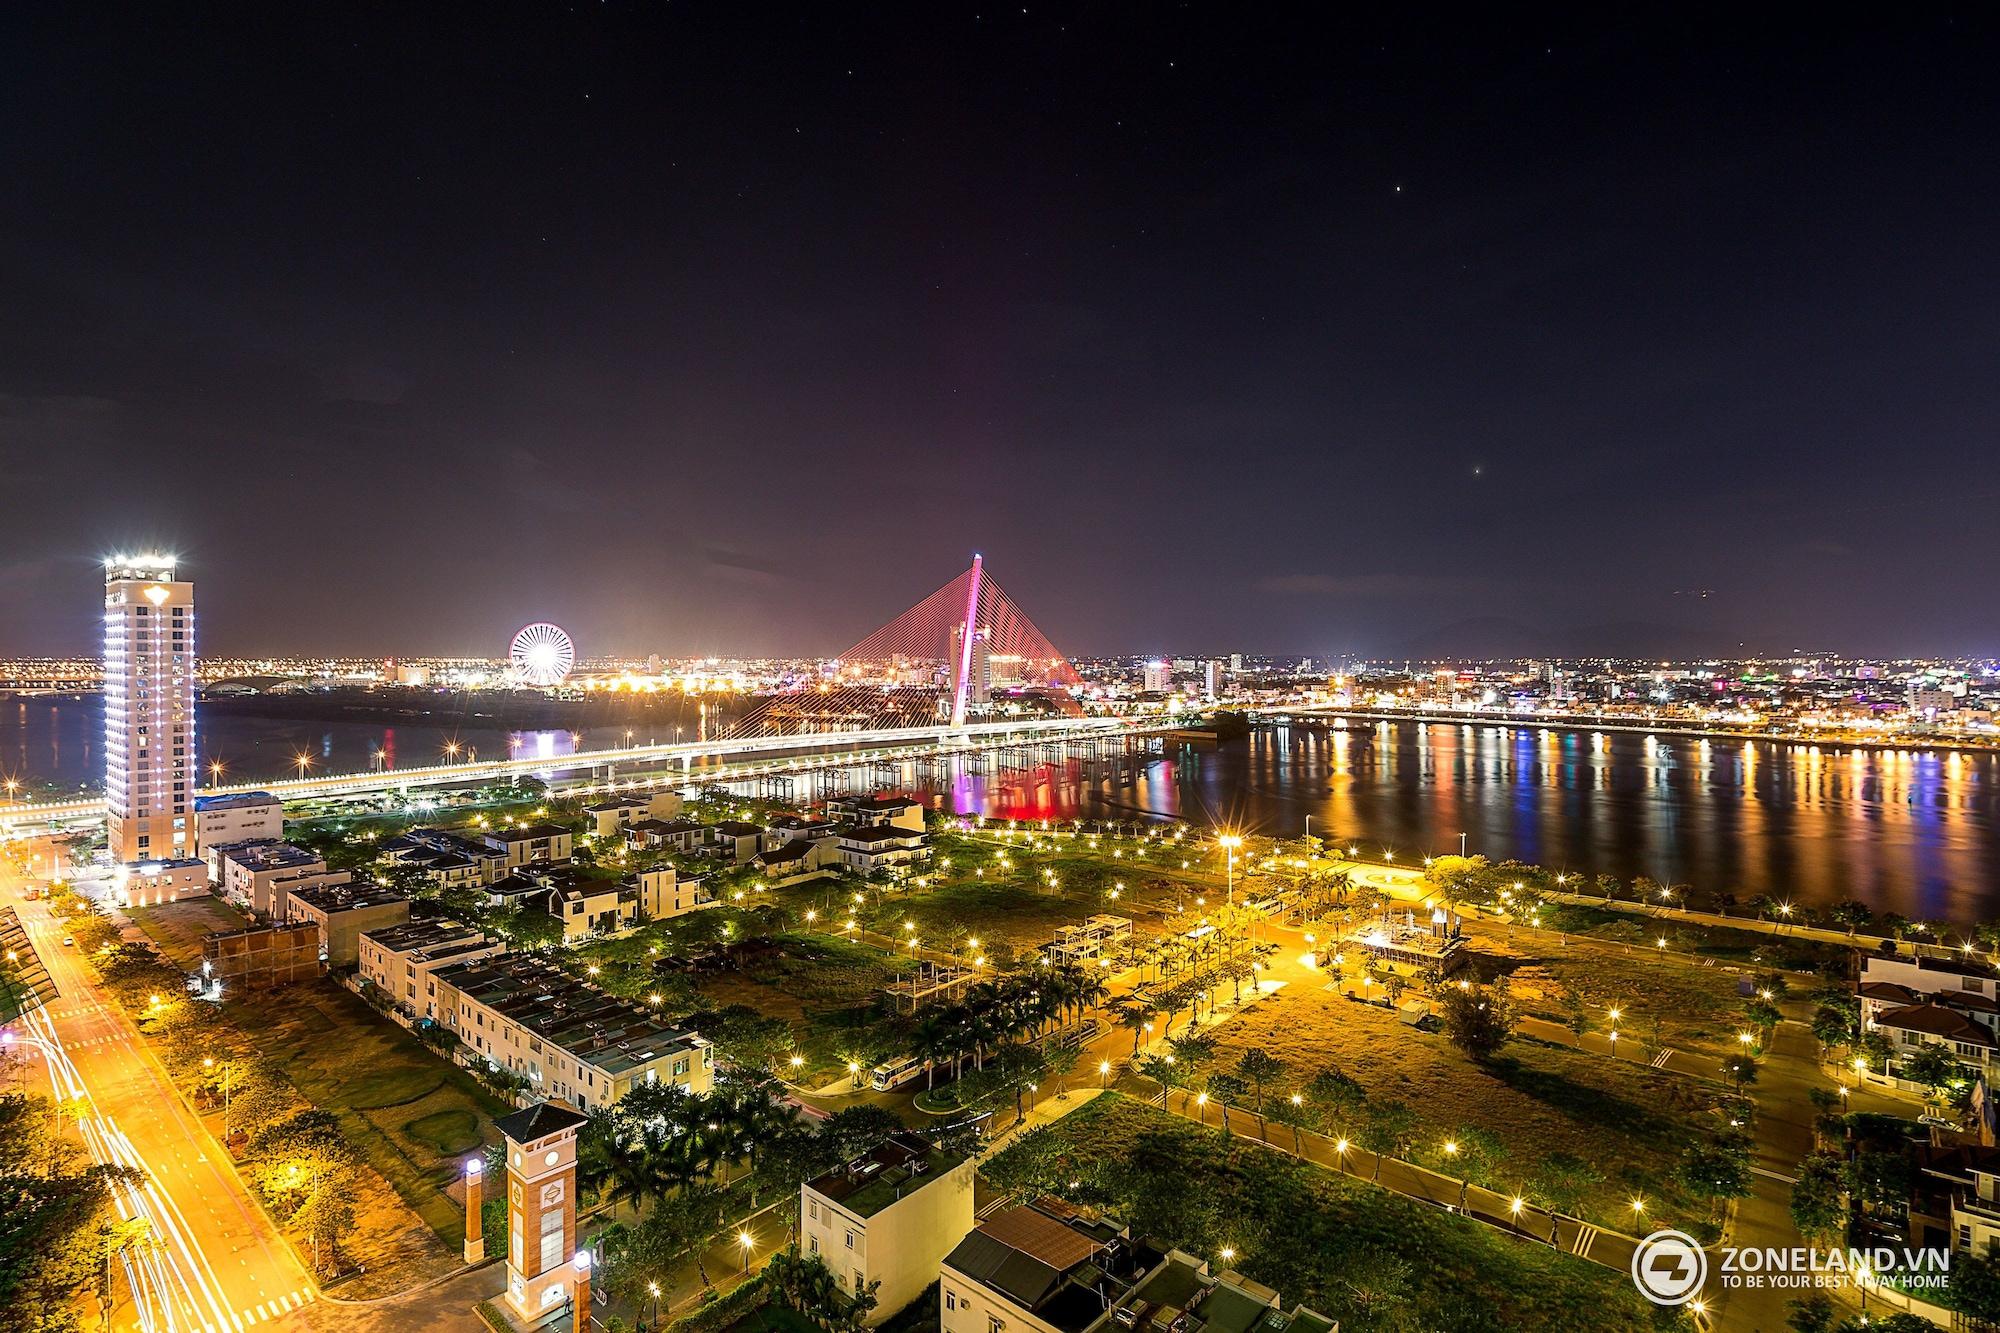 Zoneland Apartments - Monarchy Riverside, Sơn Trà